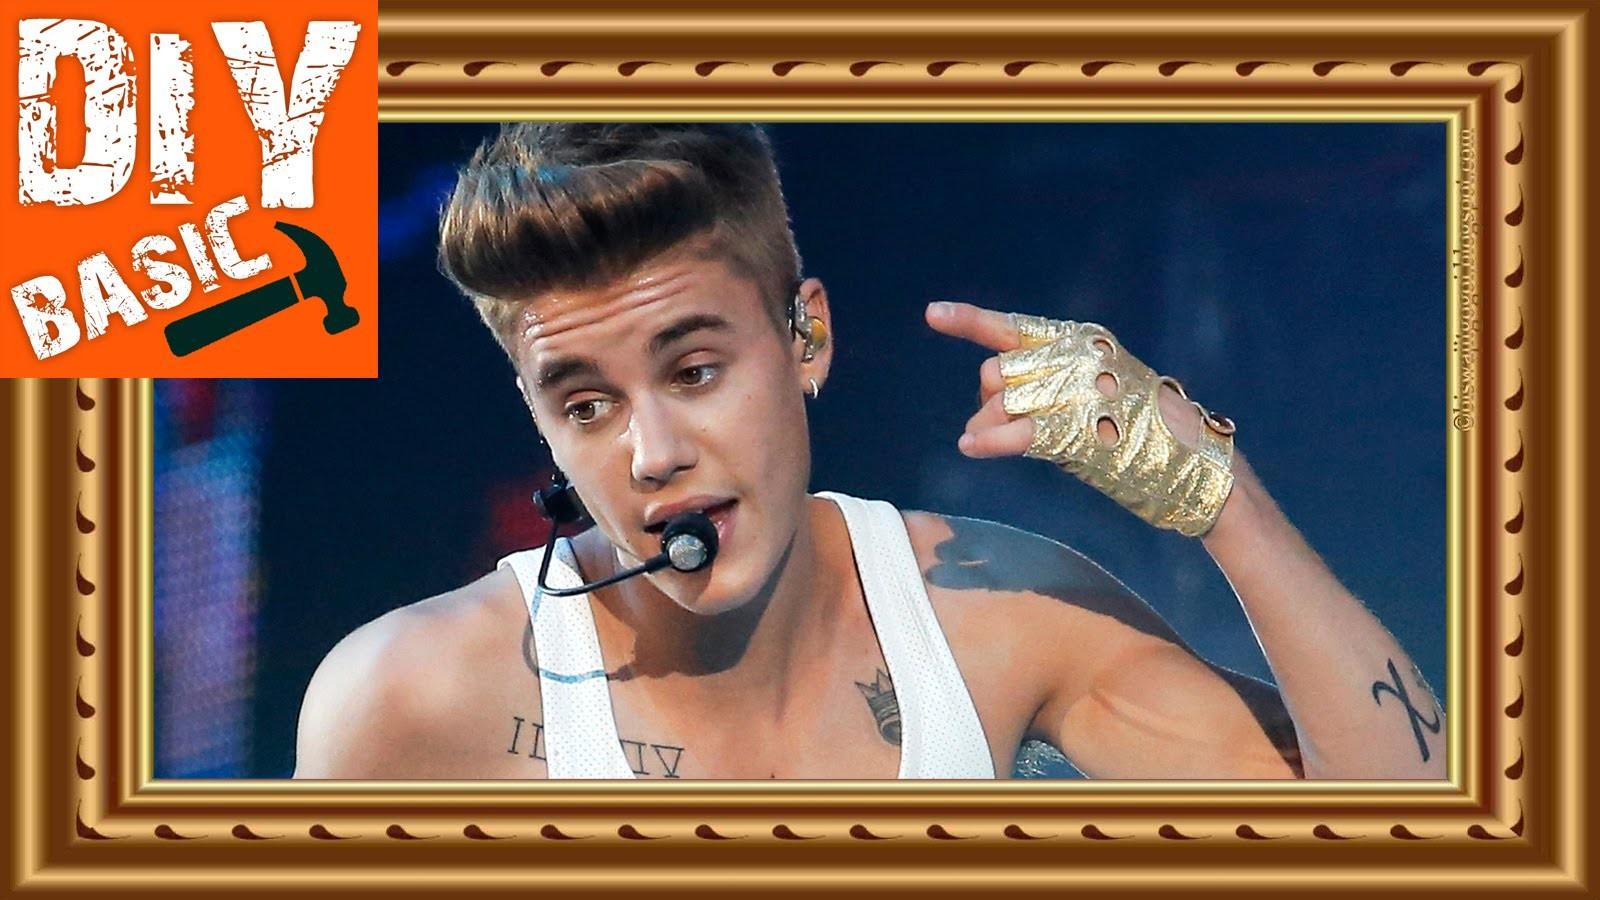 DIY: Picture Framing (Justin Bieber)